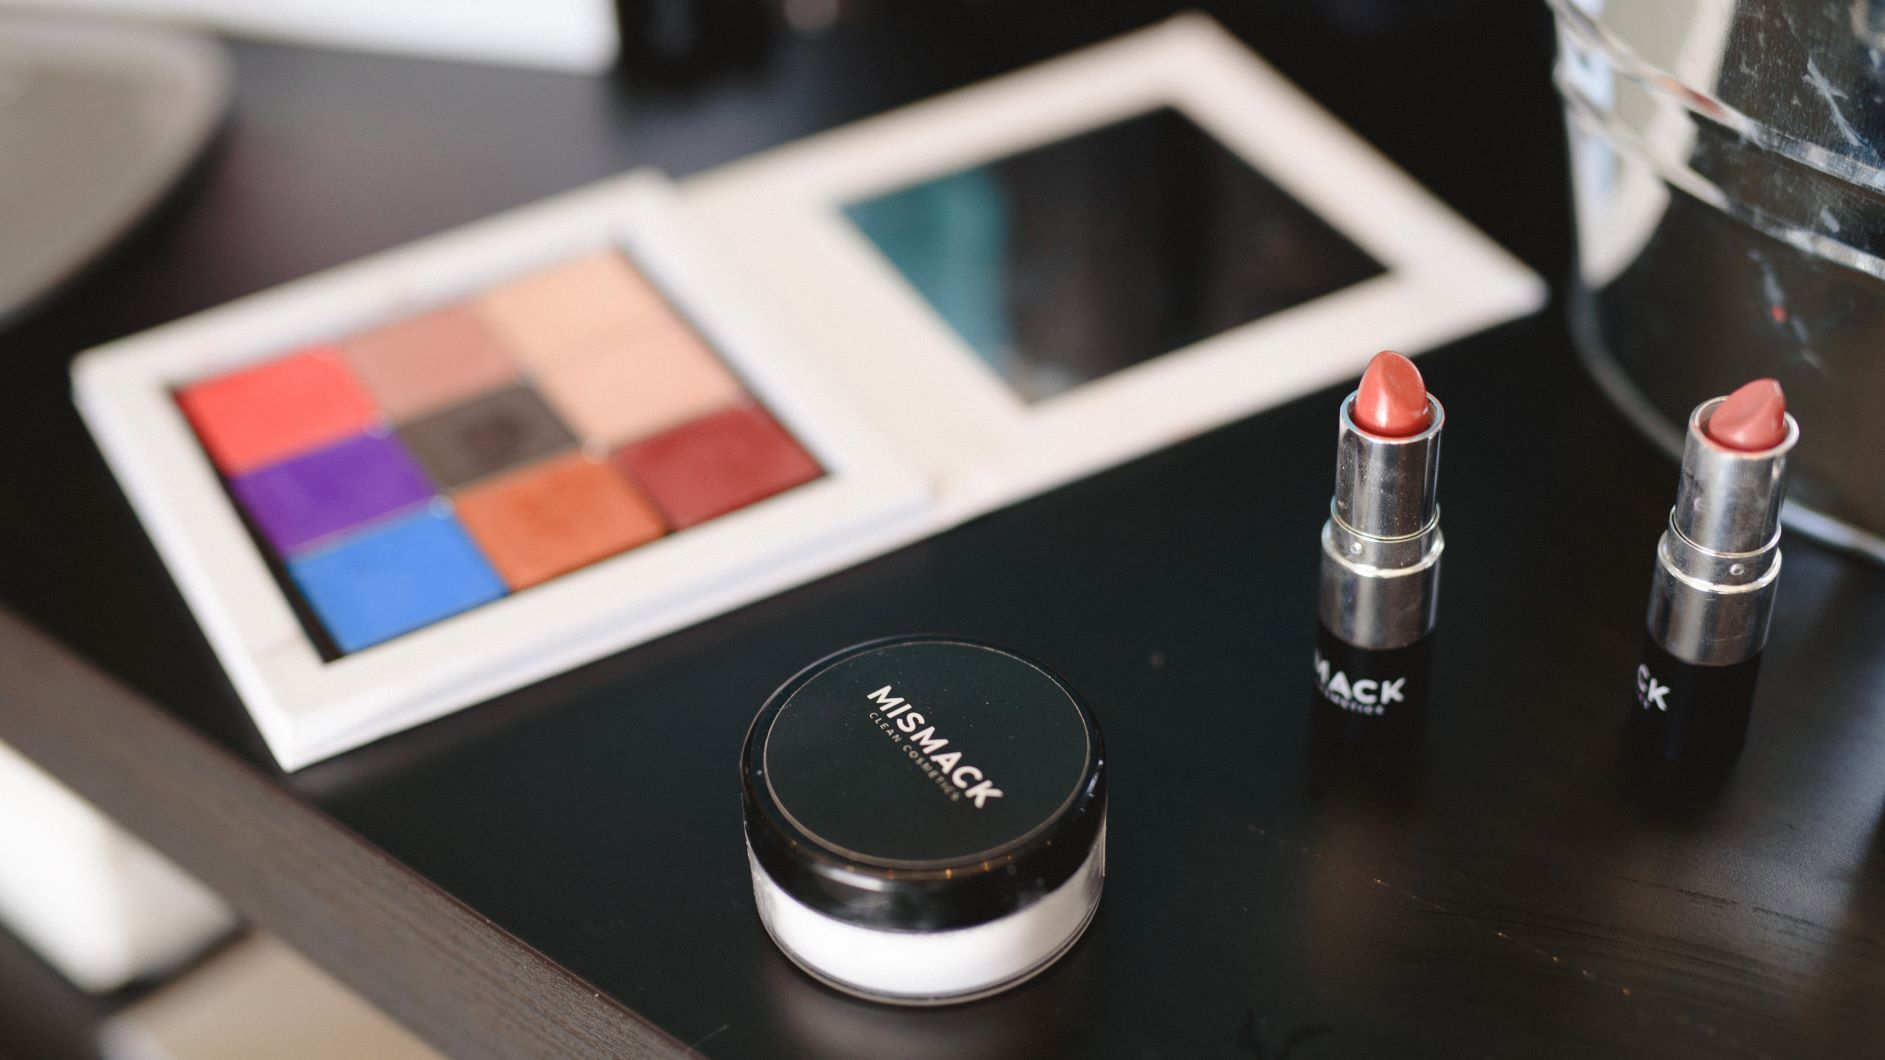 Export Navigator helped MisMacK Clean Makeup export outside of B.C